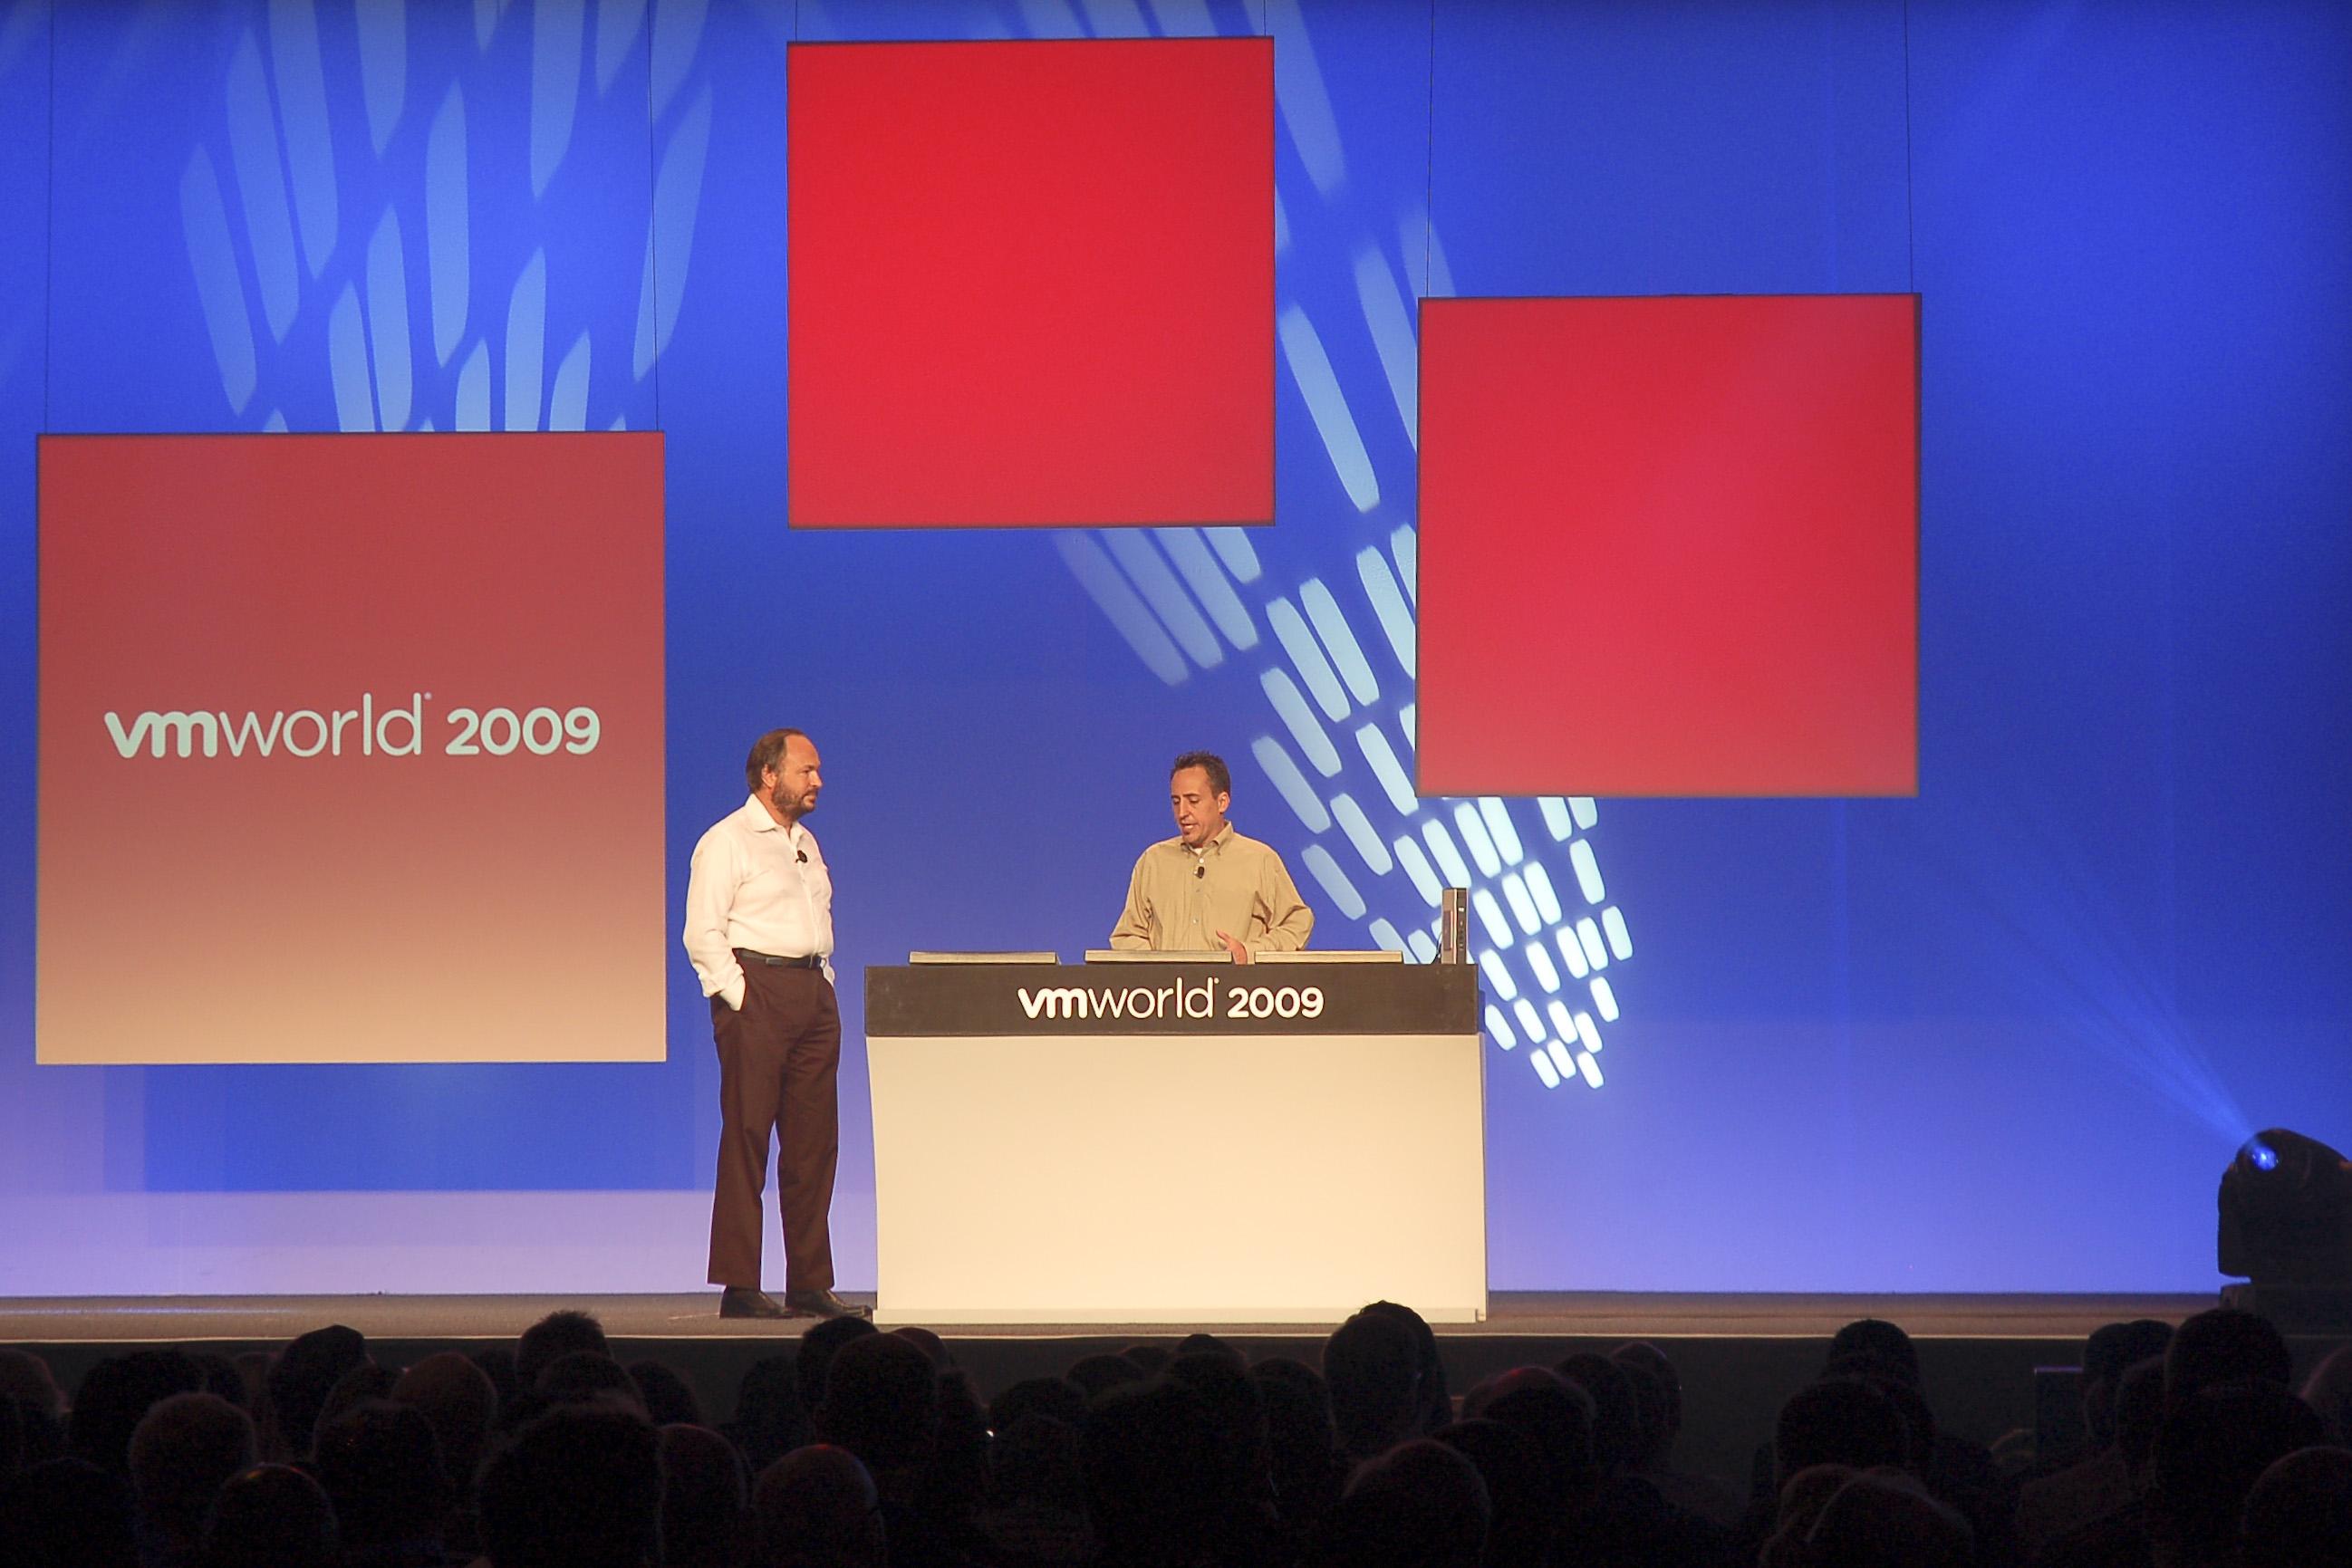 vmworldusa200901-jpg